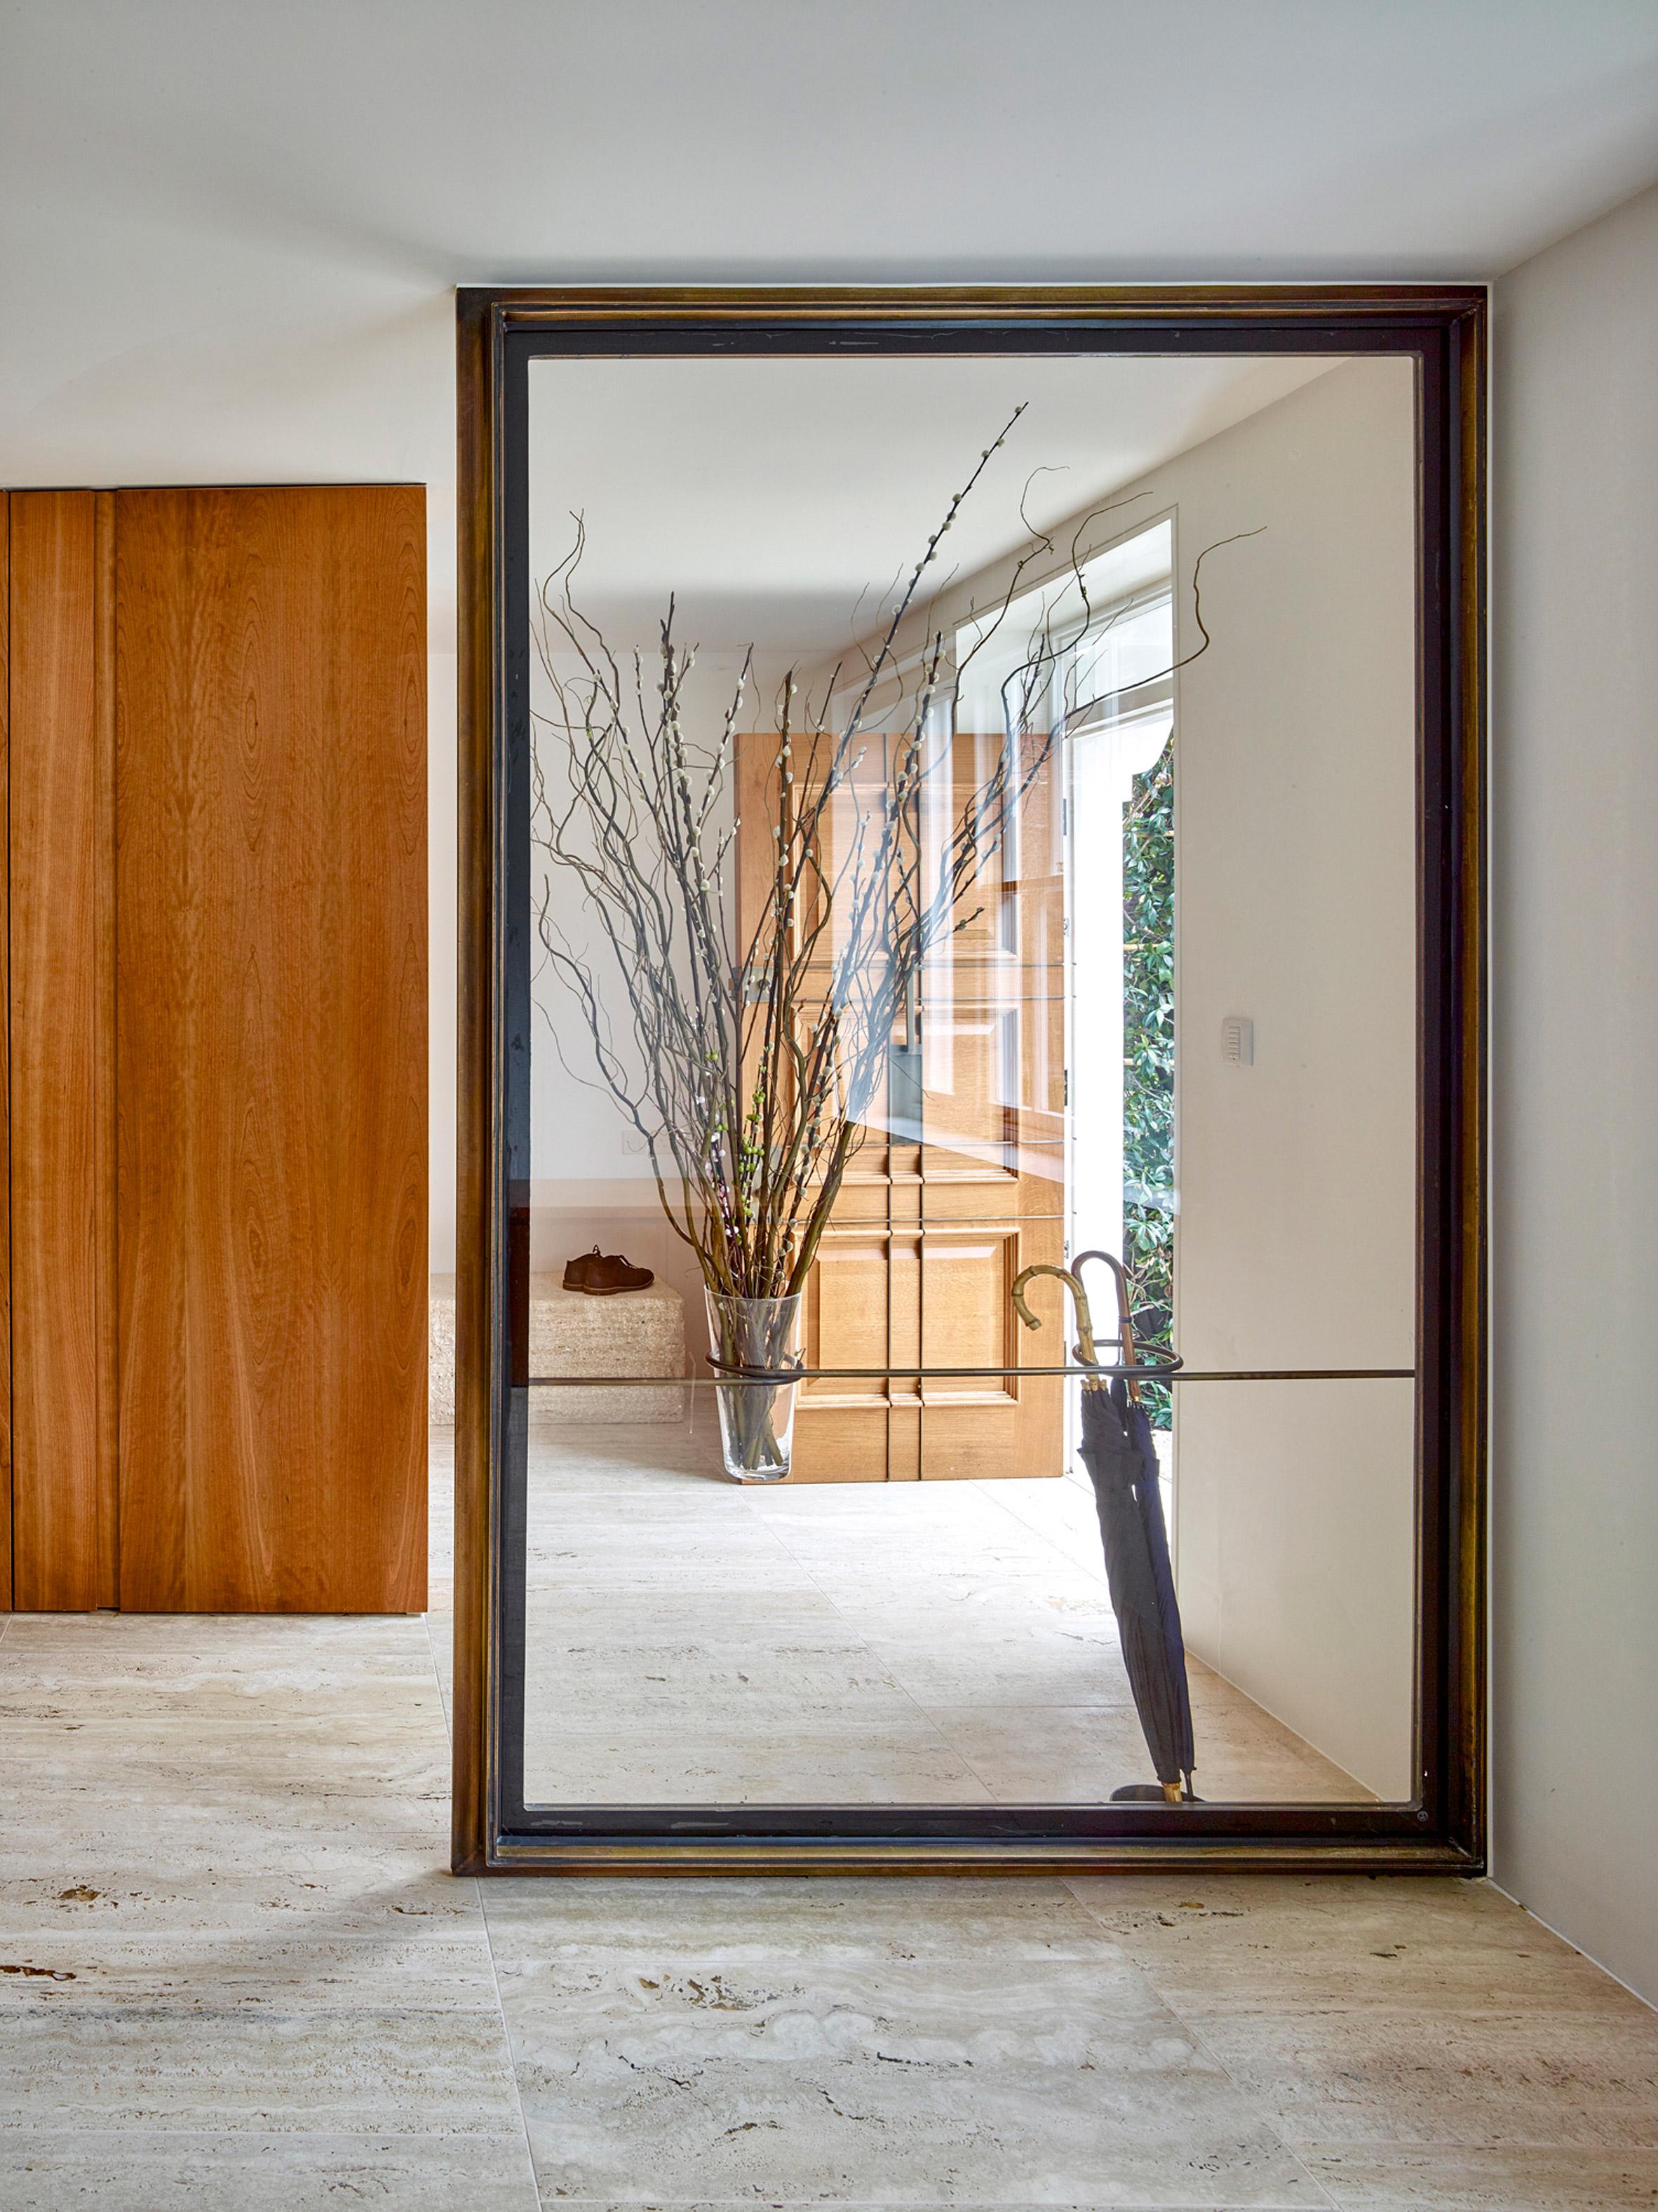 Caroline Place terrace, Kensington, London, by Amin Taha Architects + Group Work